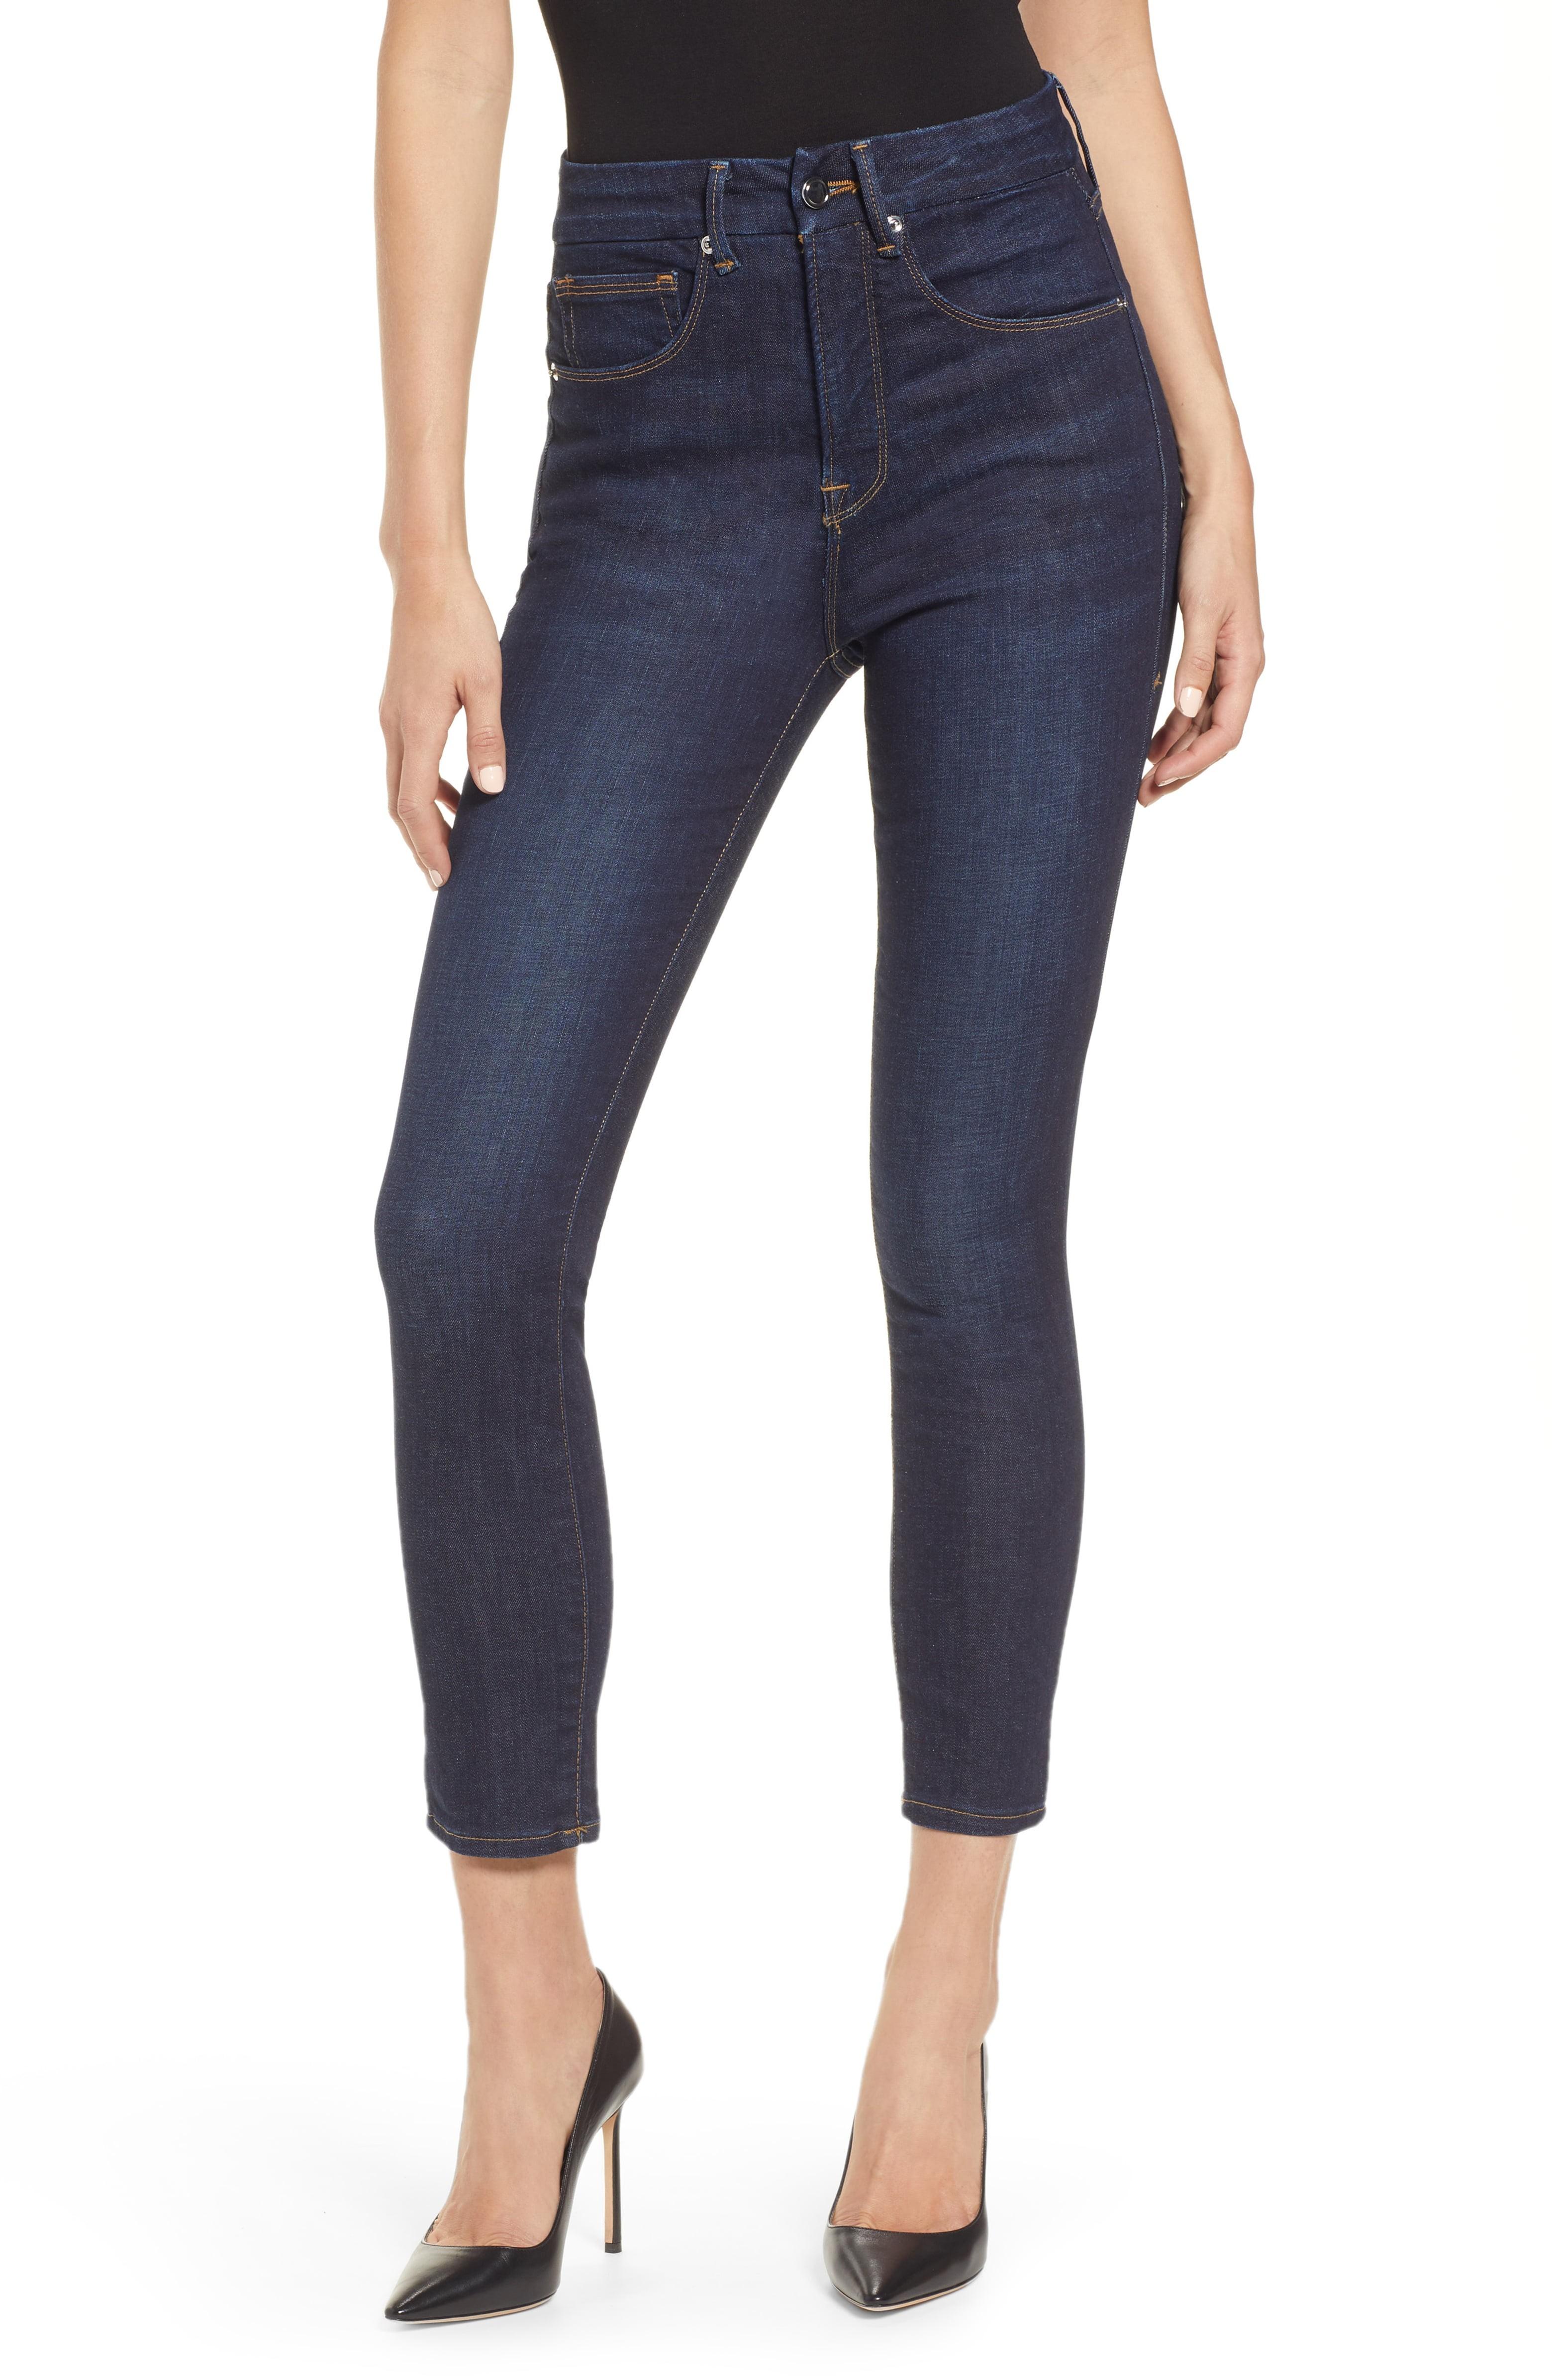 7f6dede3 Good Legs High Waist Ankle Skinny Jeans. Buy now